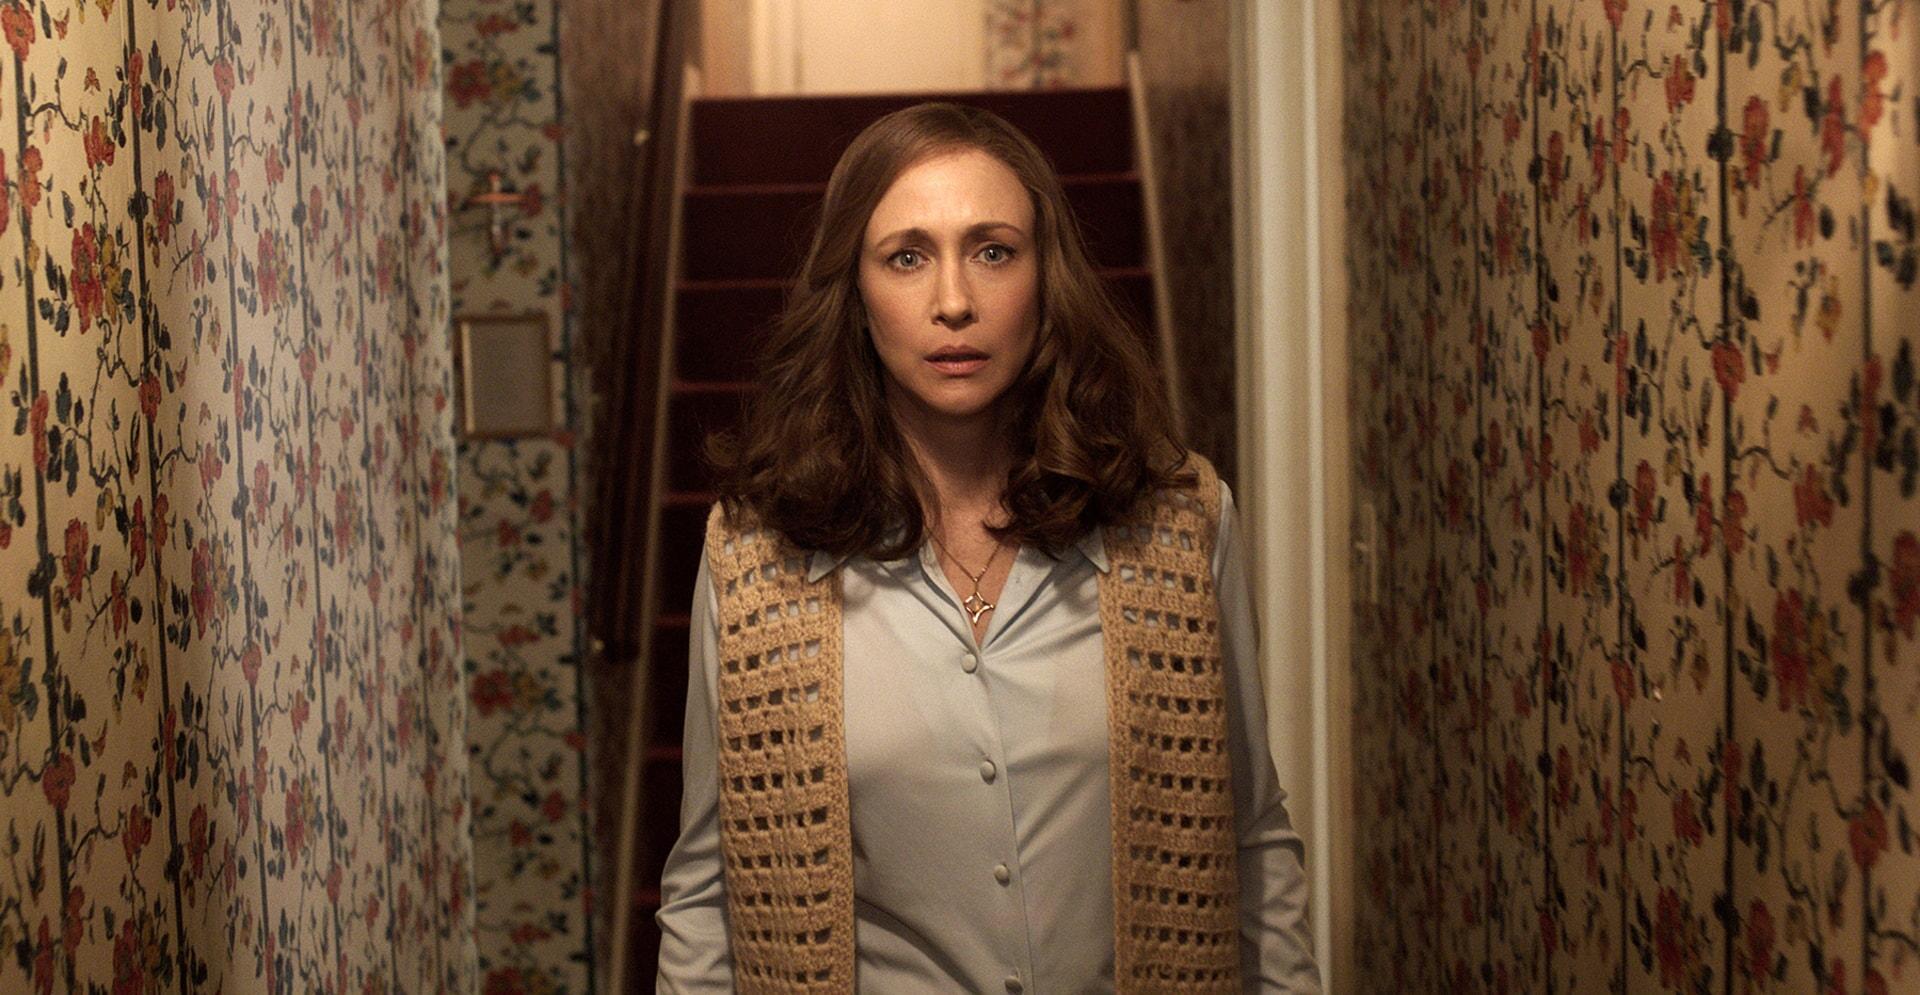 VERA FARMIGA as Lorraine Warren standing in front of a staircase wearing a crocheted sweater vest